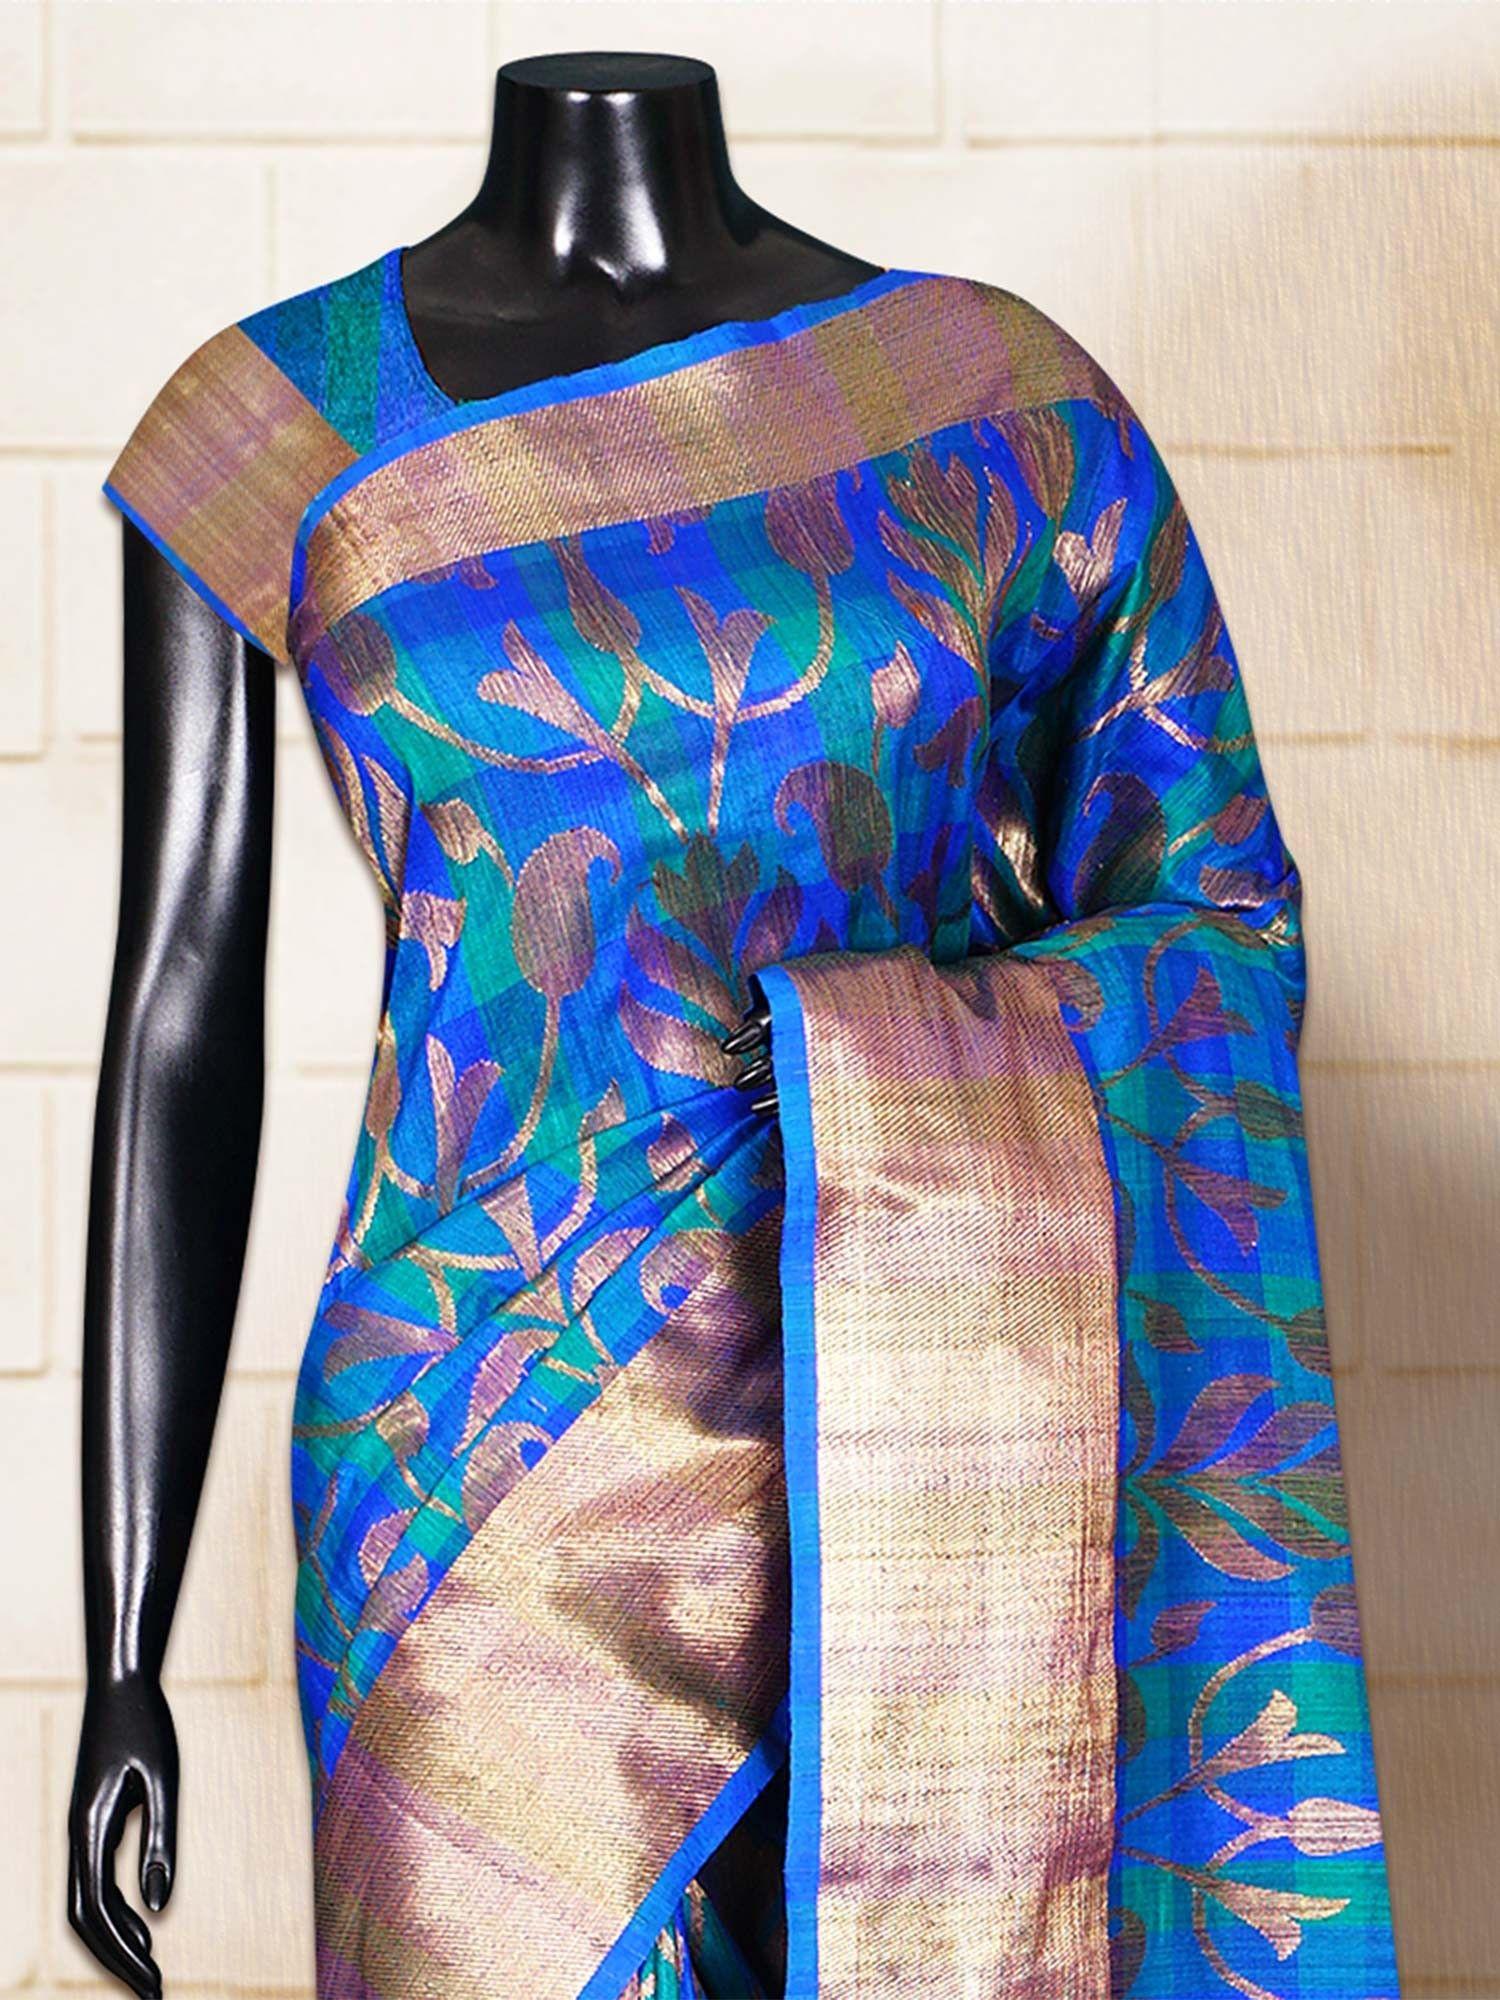 Pure silk saree green blue dupion patola self border u pallu handloom saree